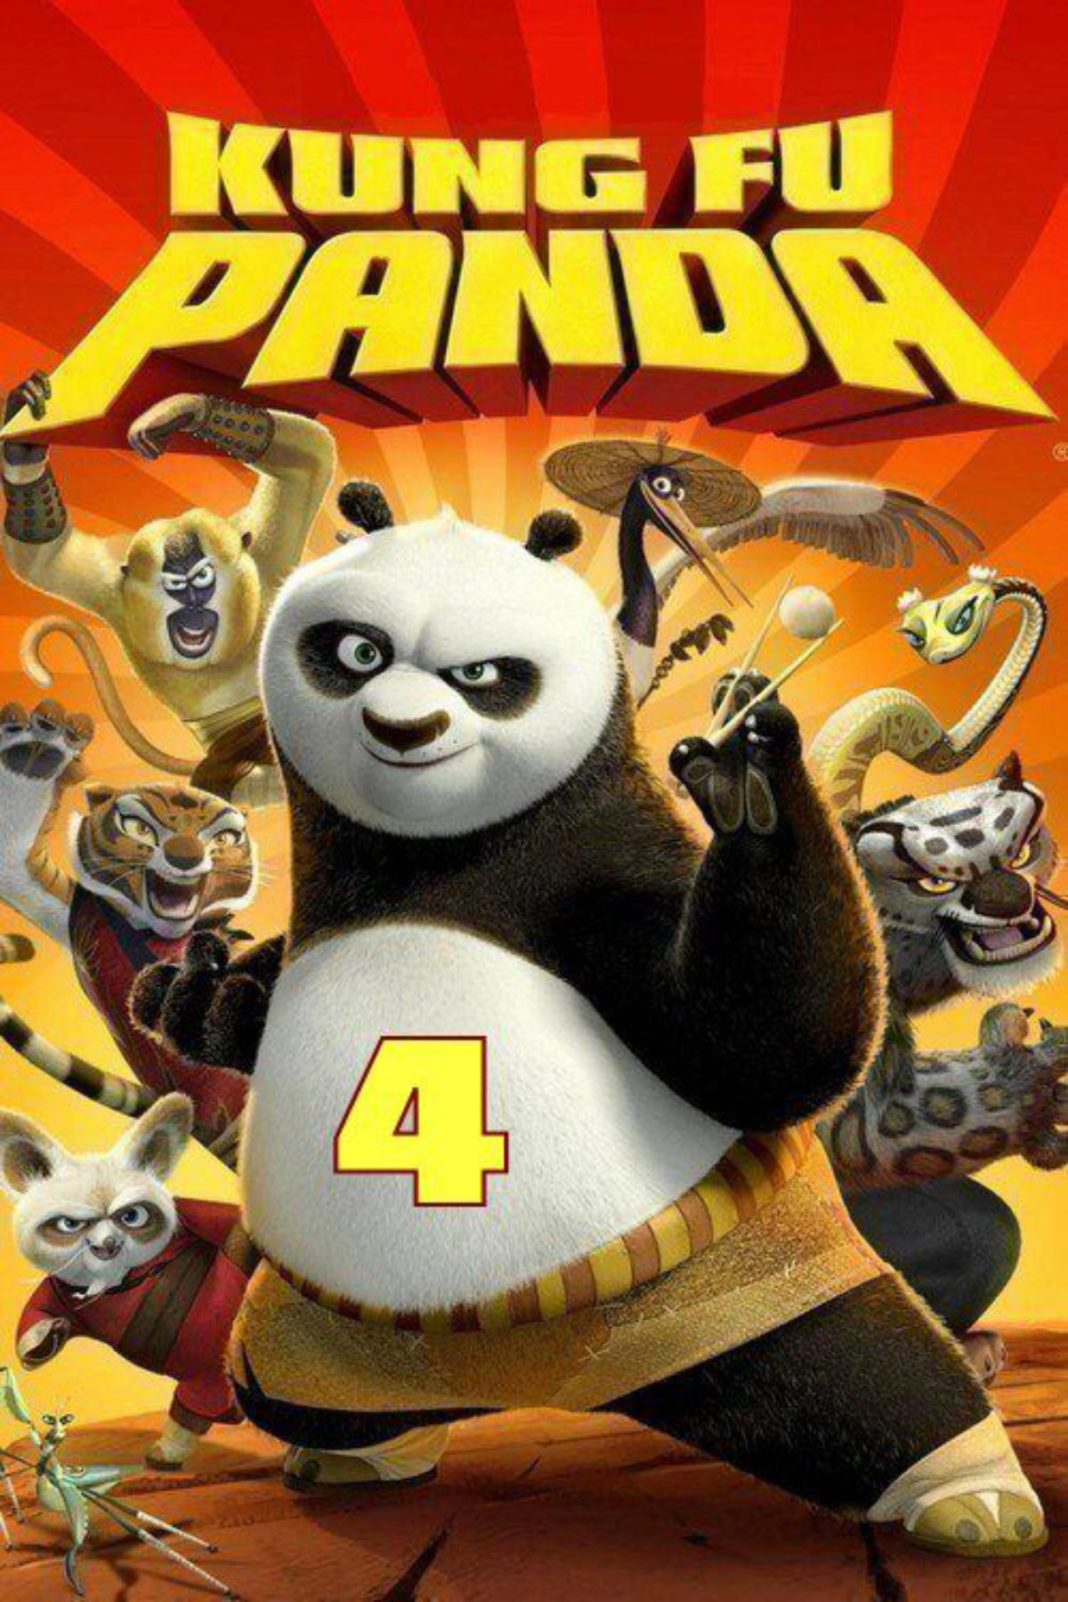 Stand a chance to catch Kung Fu Panda 3 at Krispy Kreme